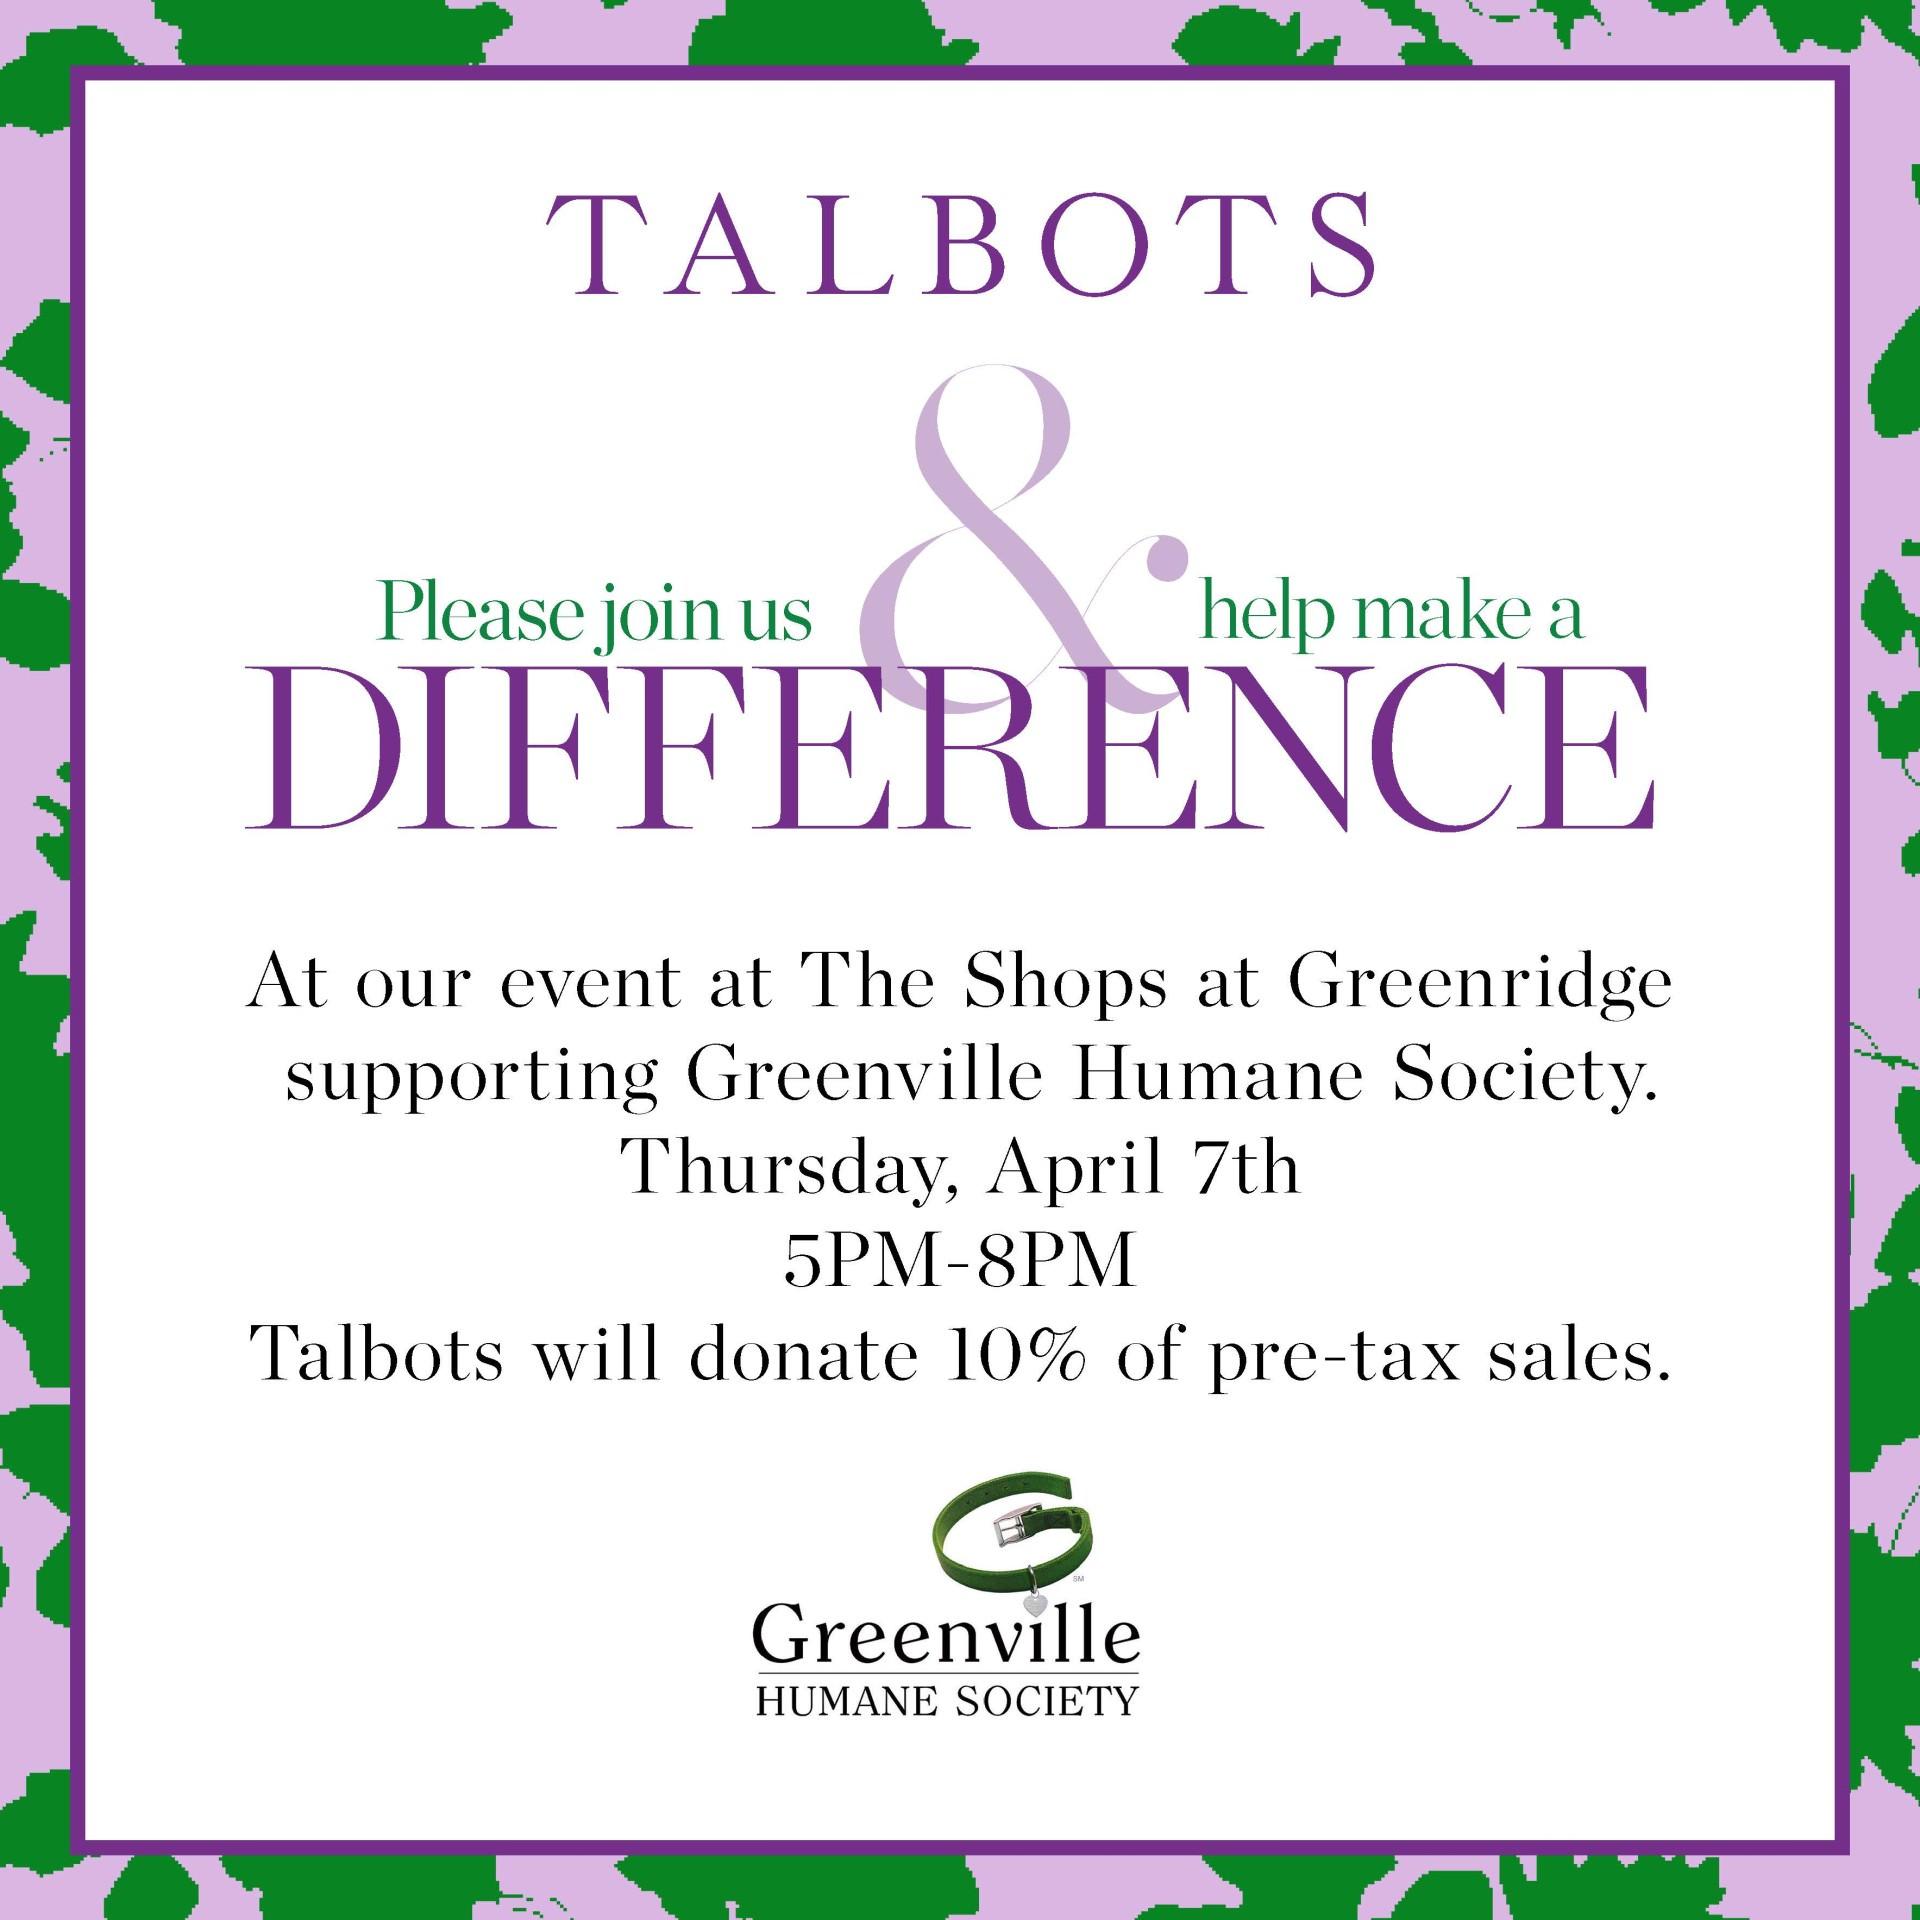 talbots fundraising event greenville humane society greenville sc